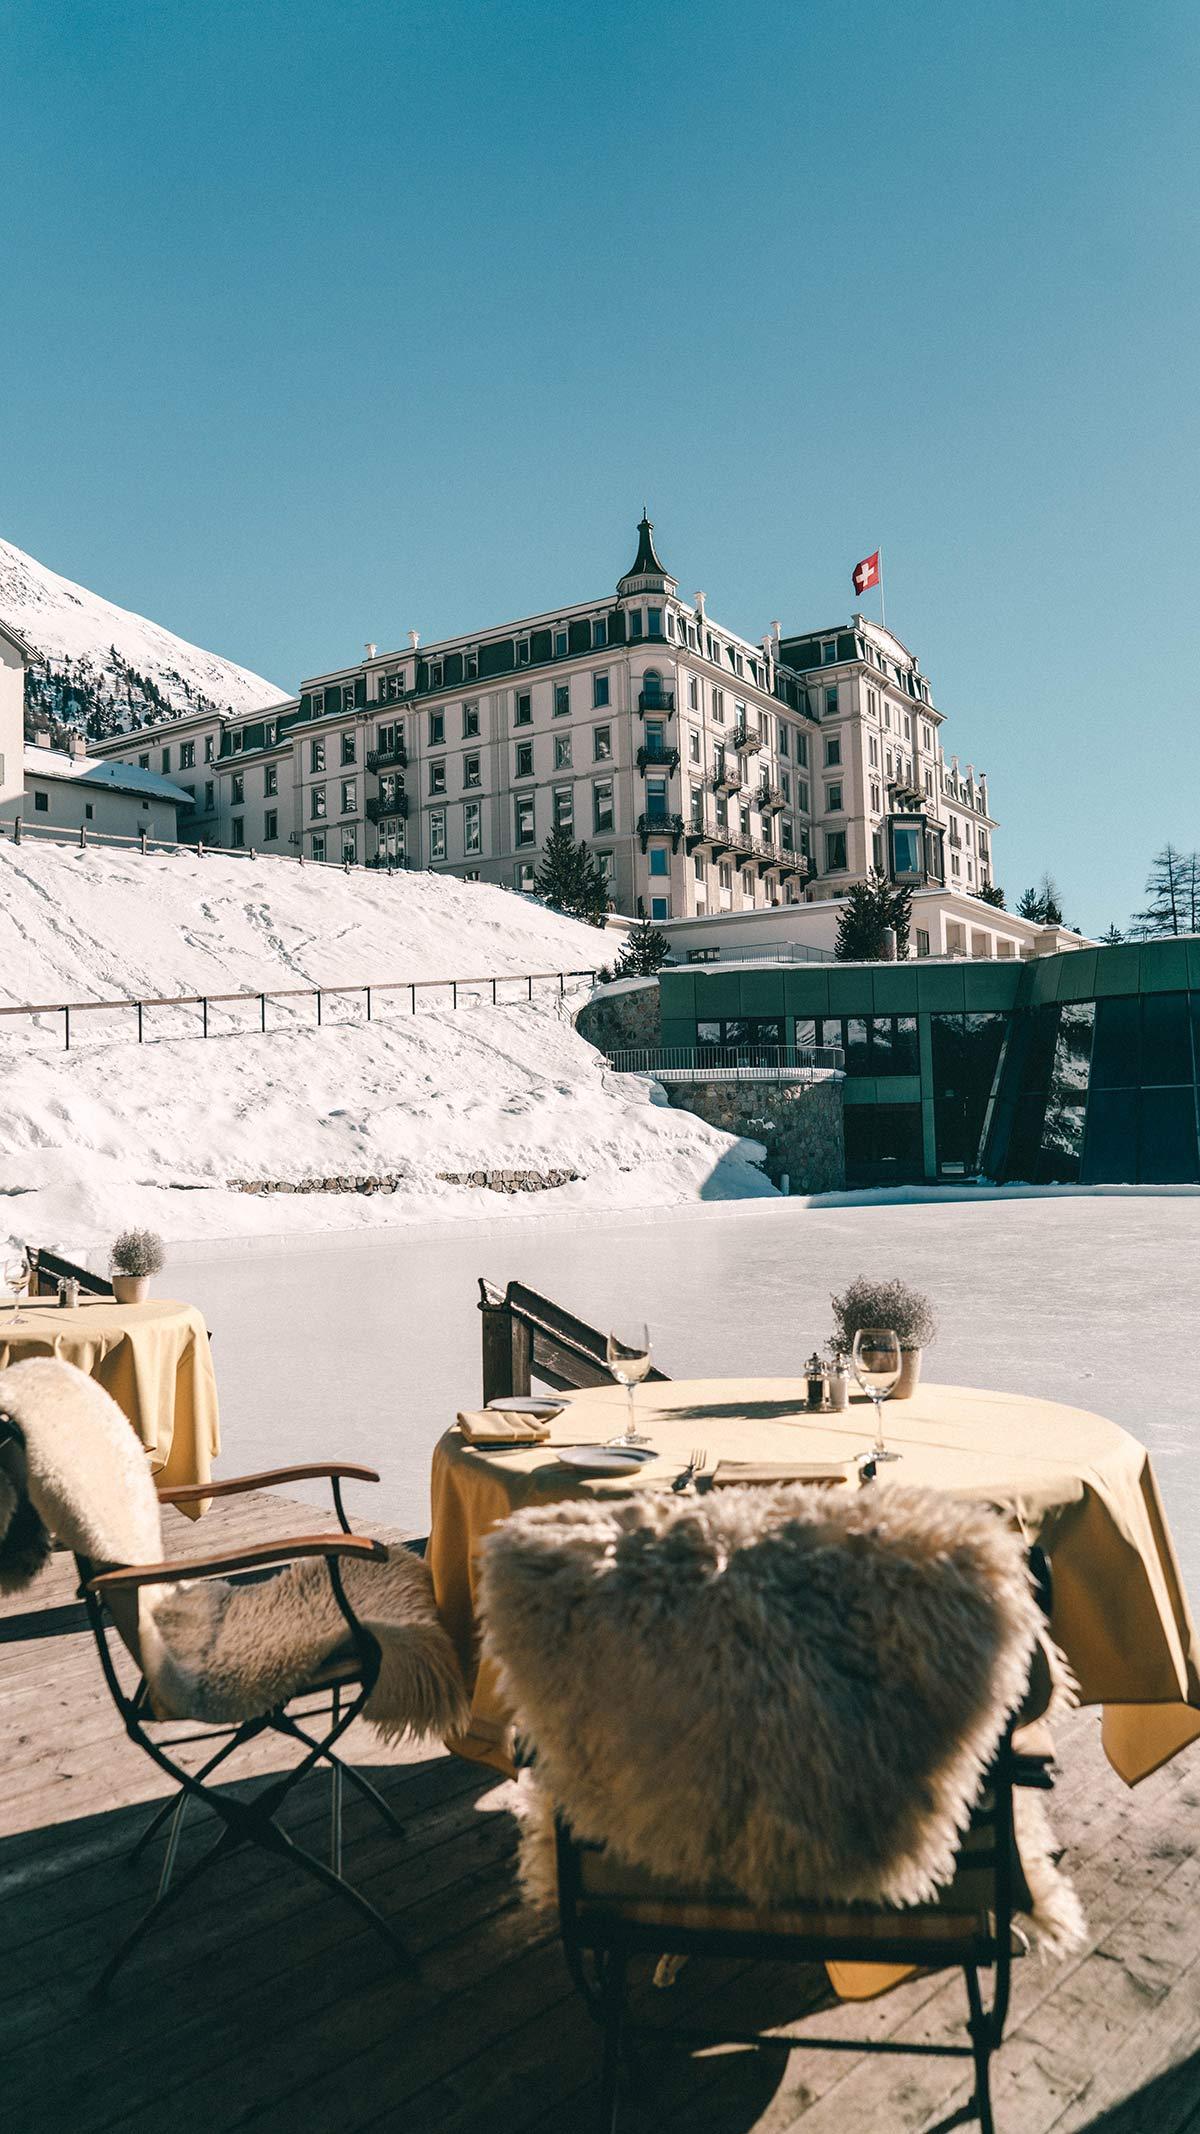 Schweiz Grand Hotel Kronenhof